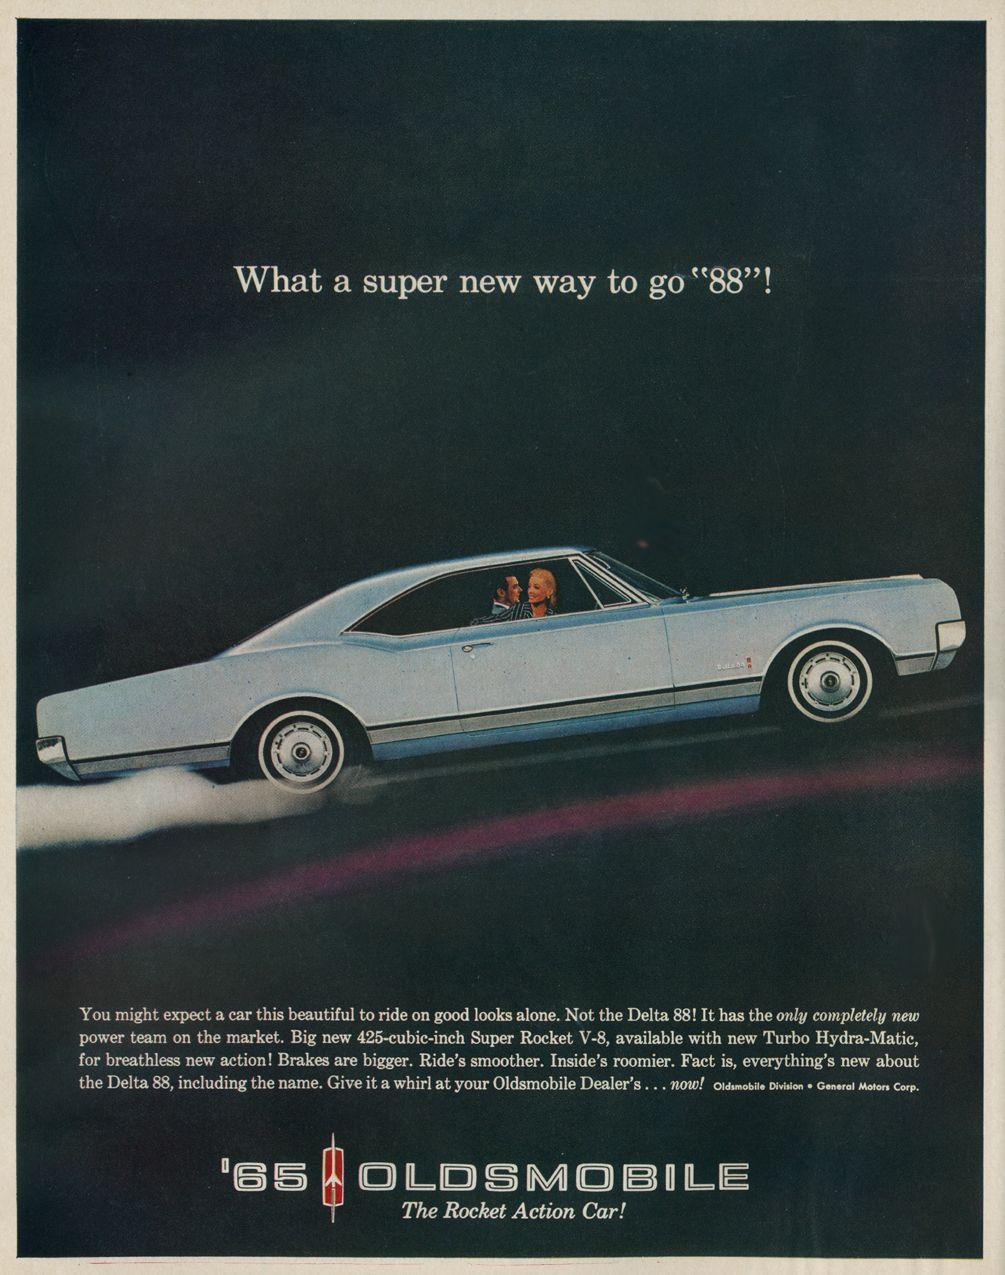 1965 oldsmobile car advert [ 1005 x 1275 Pixel ]